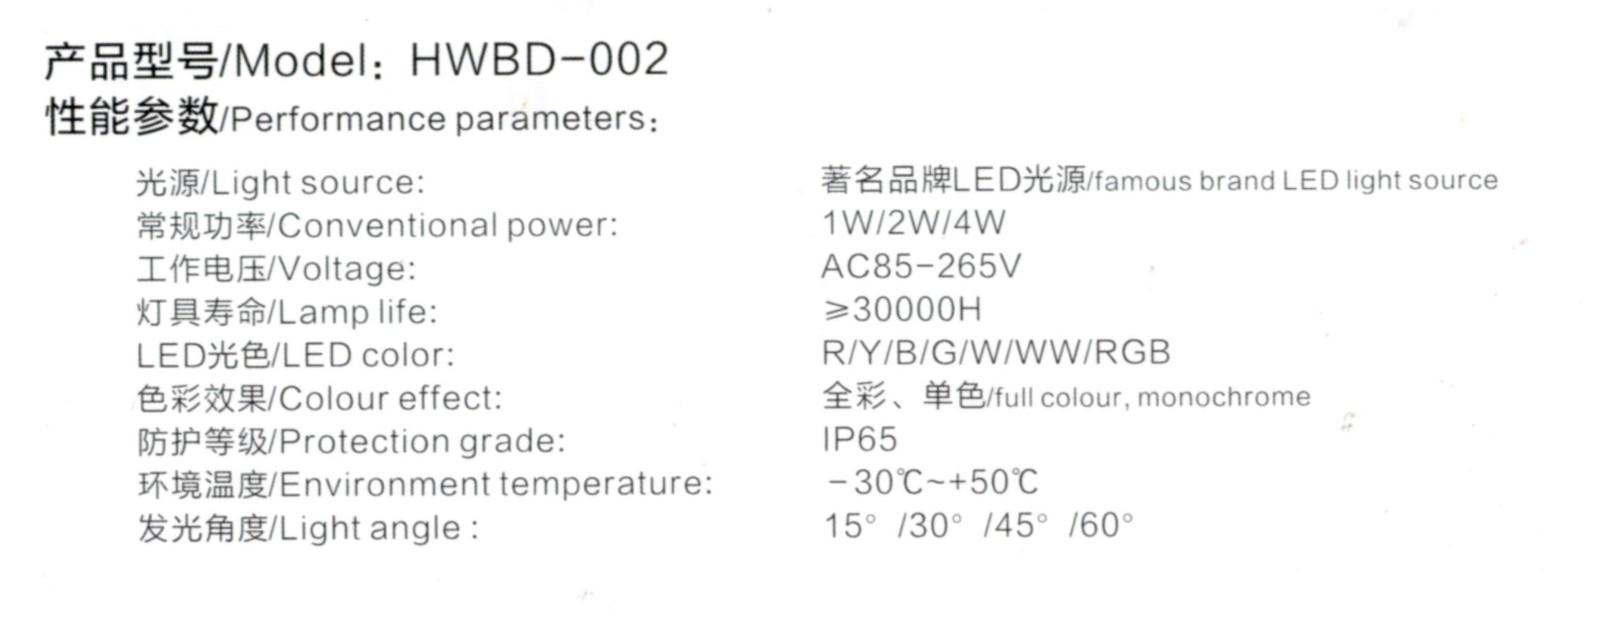 LED户外壁灯Model∶HWBD-002参数.jpg